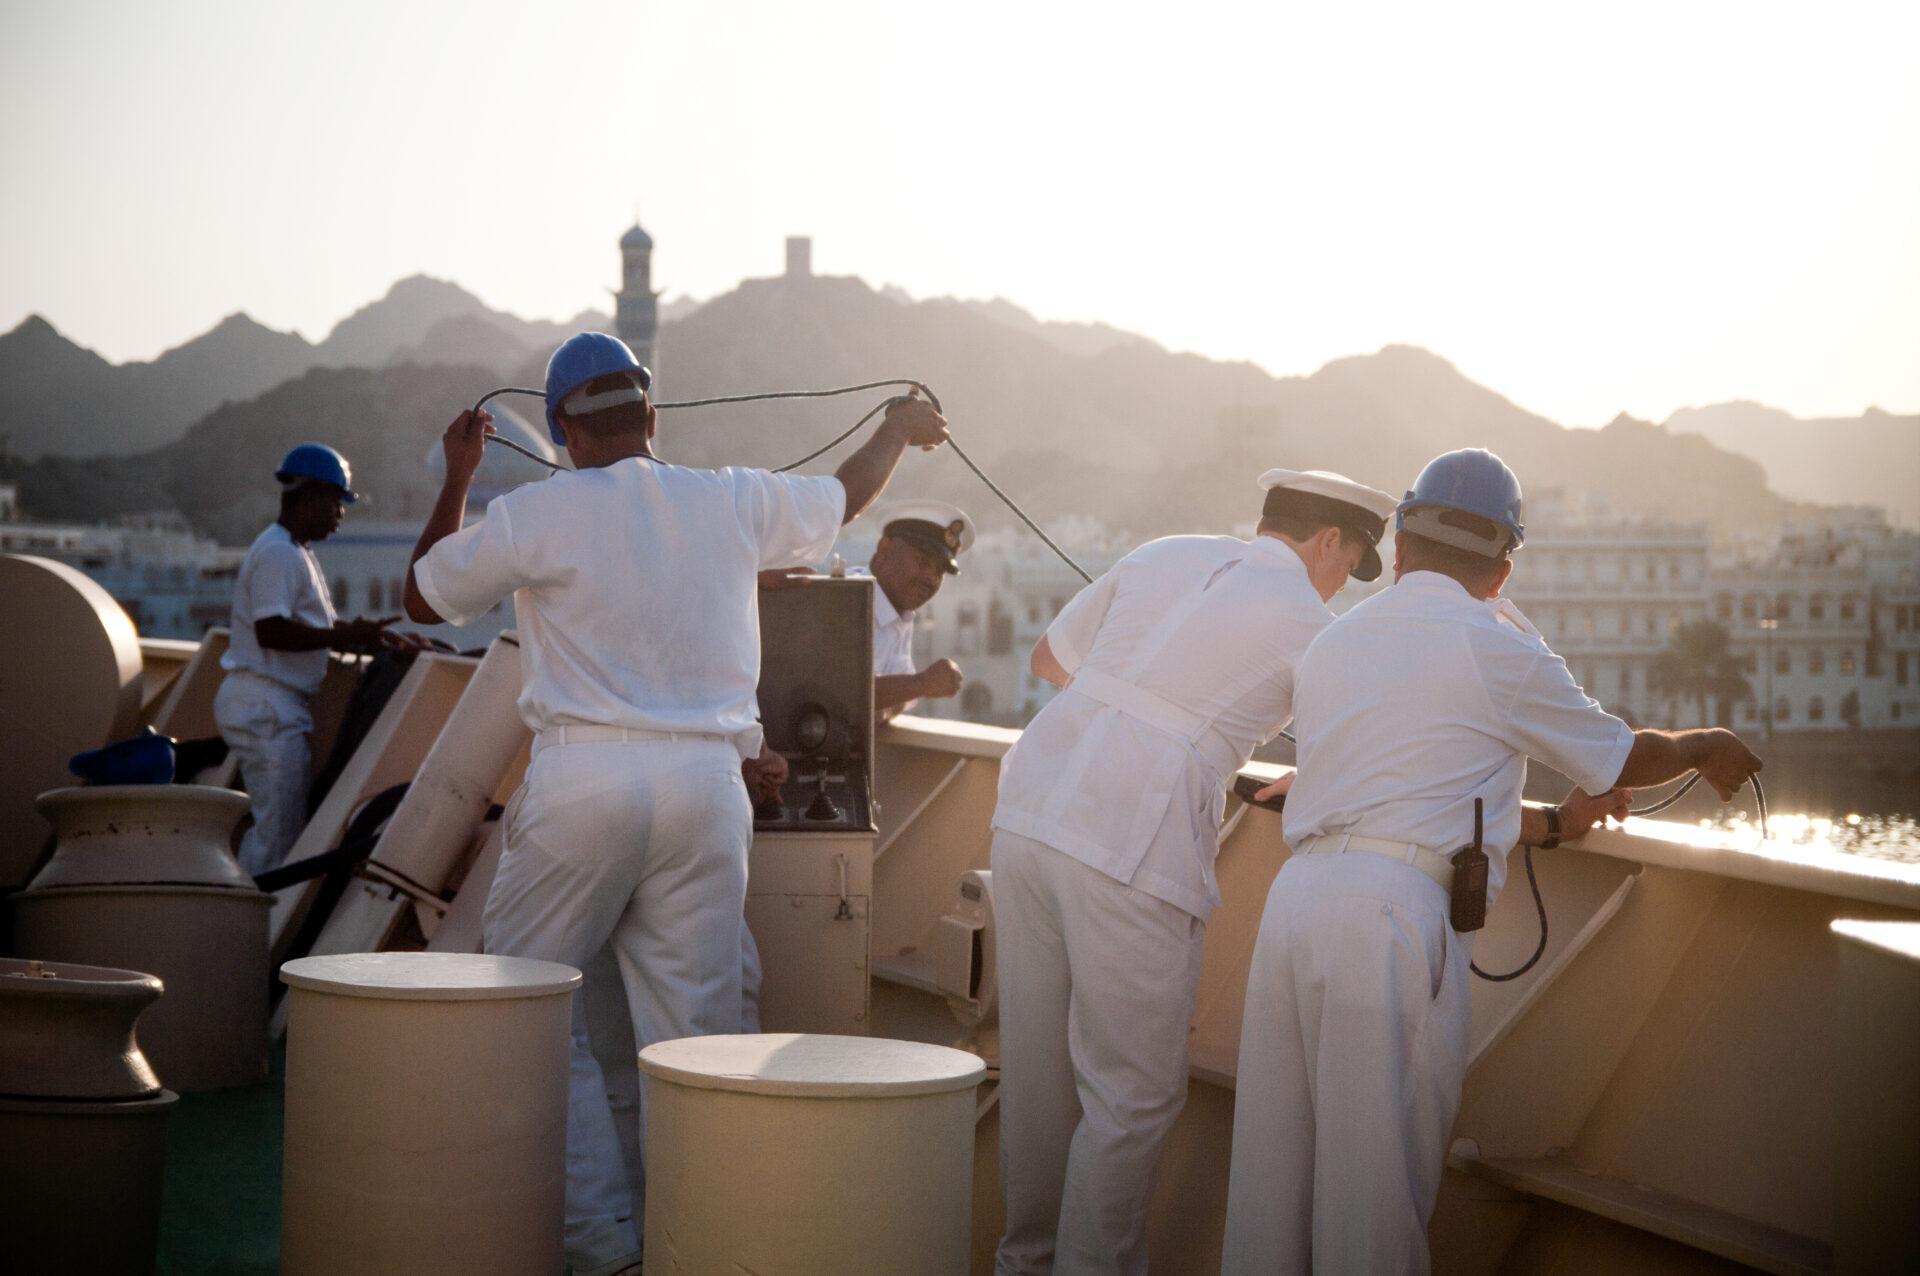 Oman_IGP0041b_Carolin Weinkopf